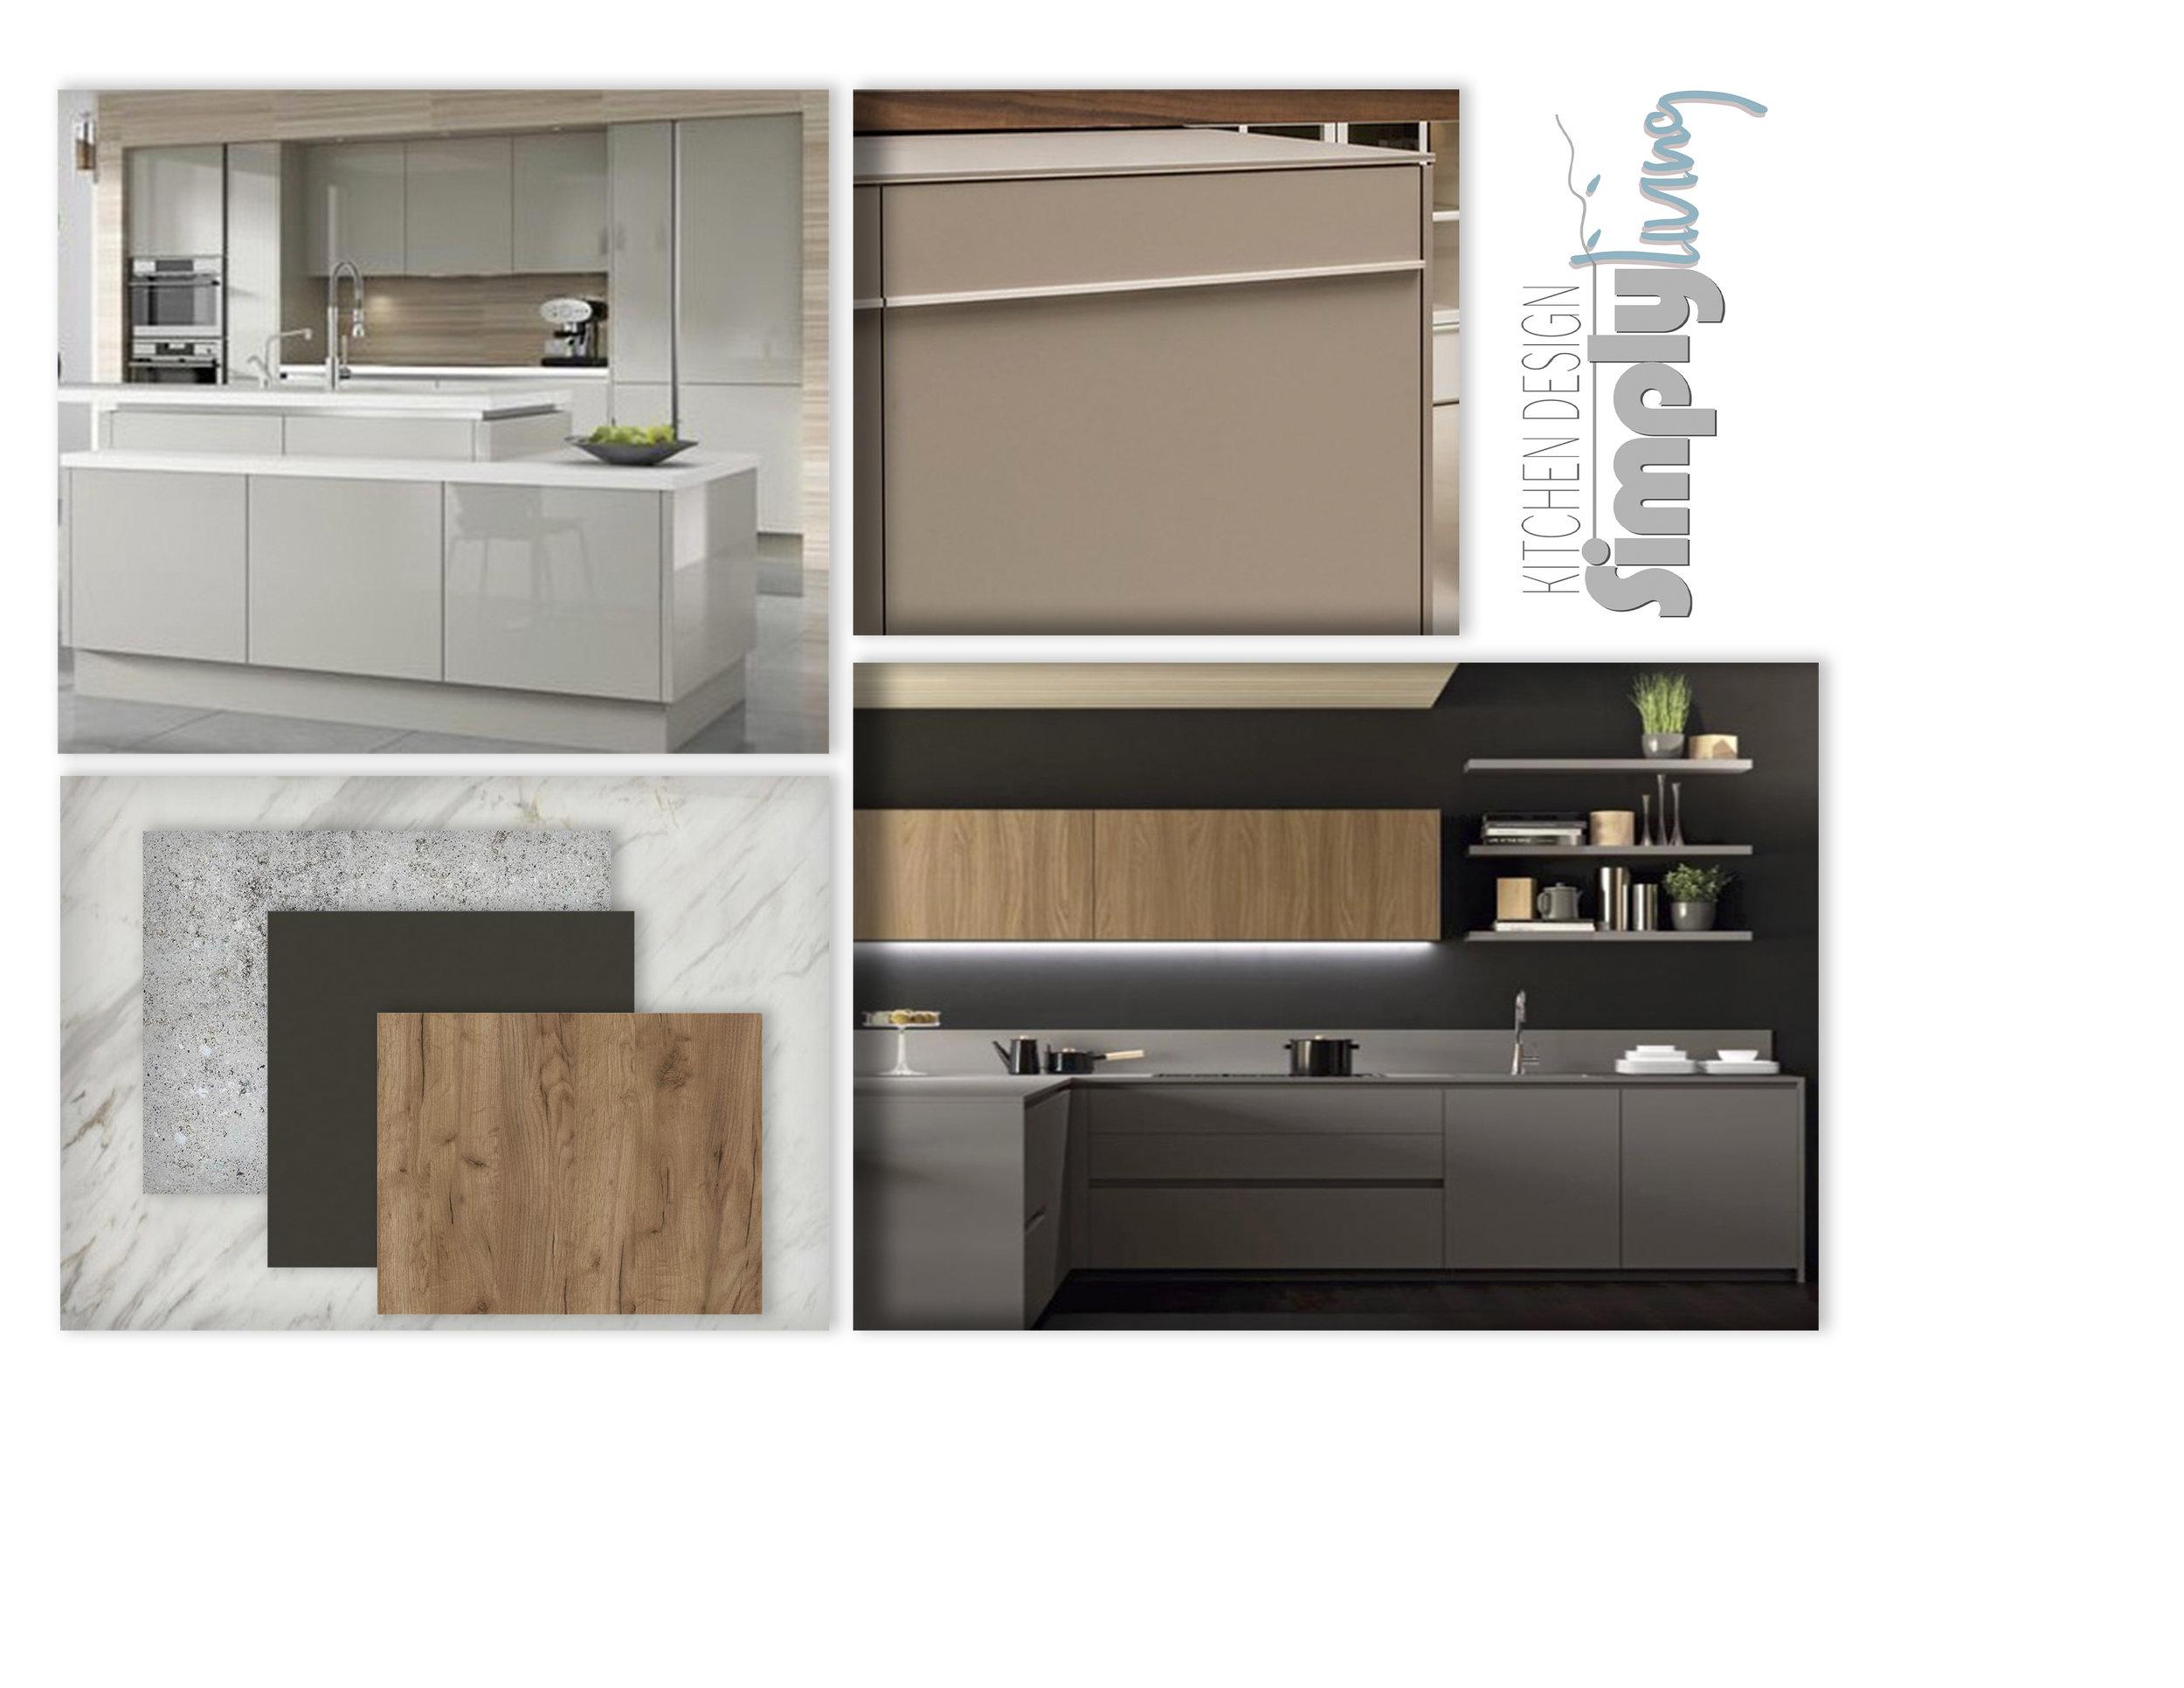 Kitchen Mood 2-1.jpg